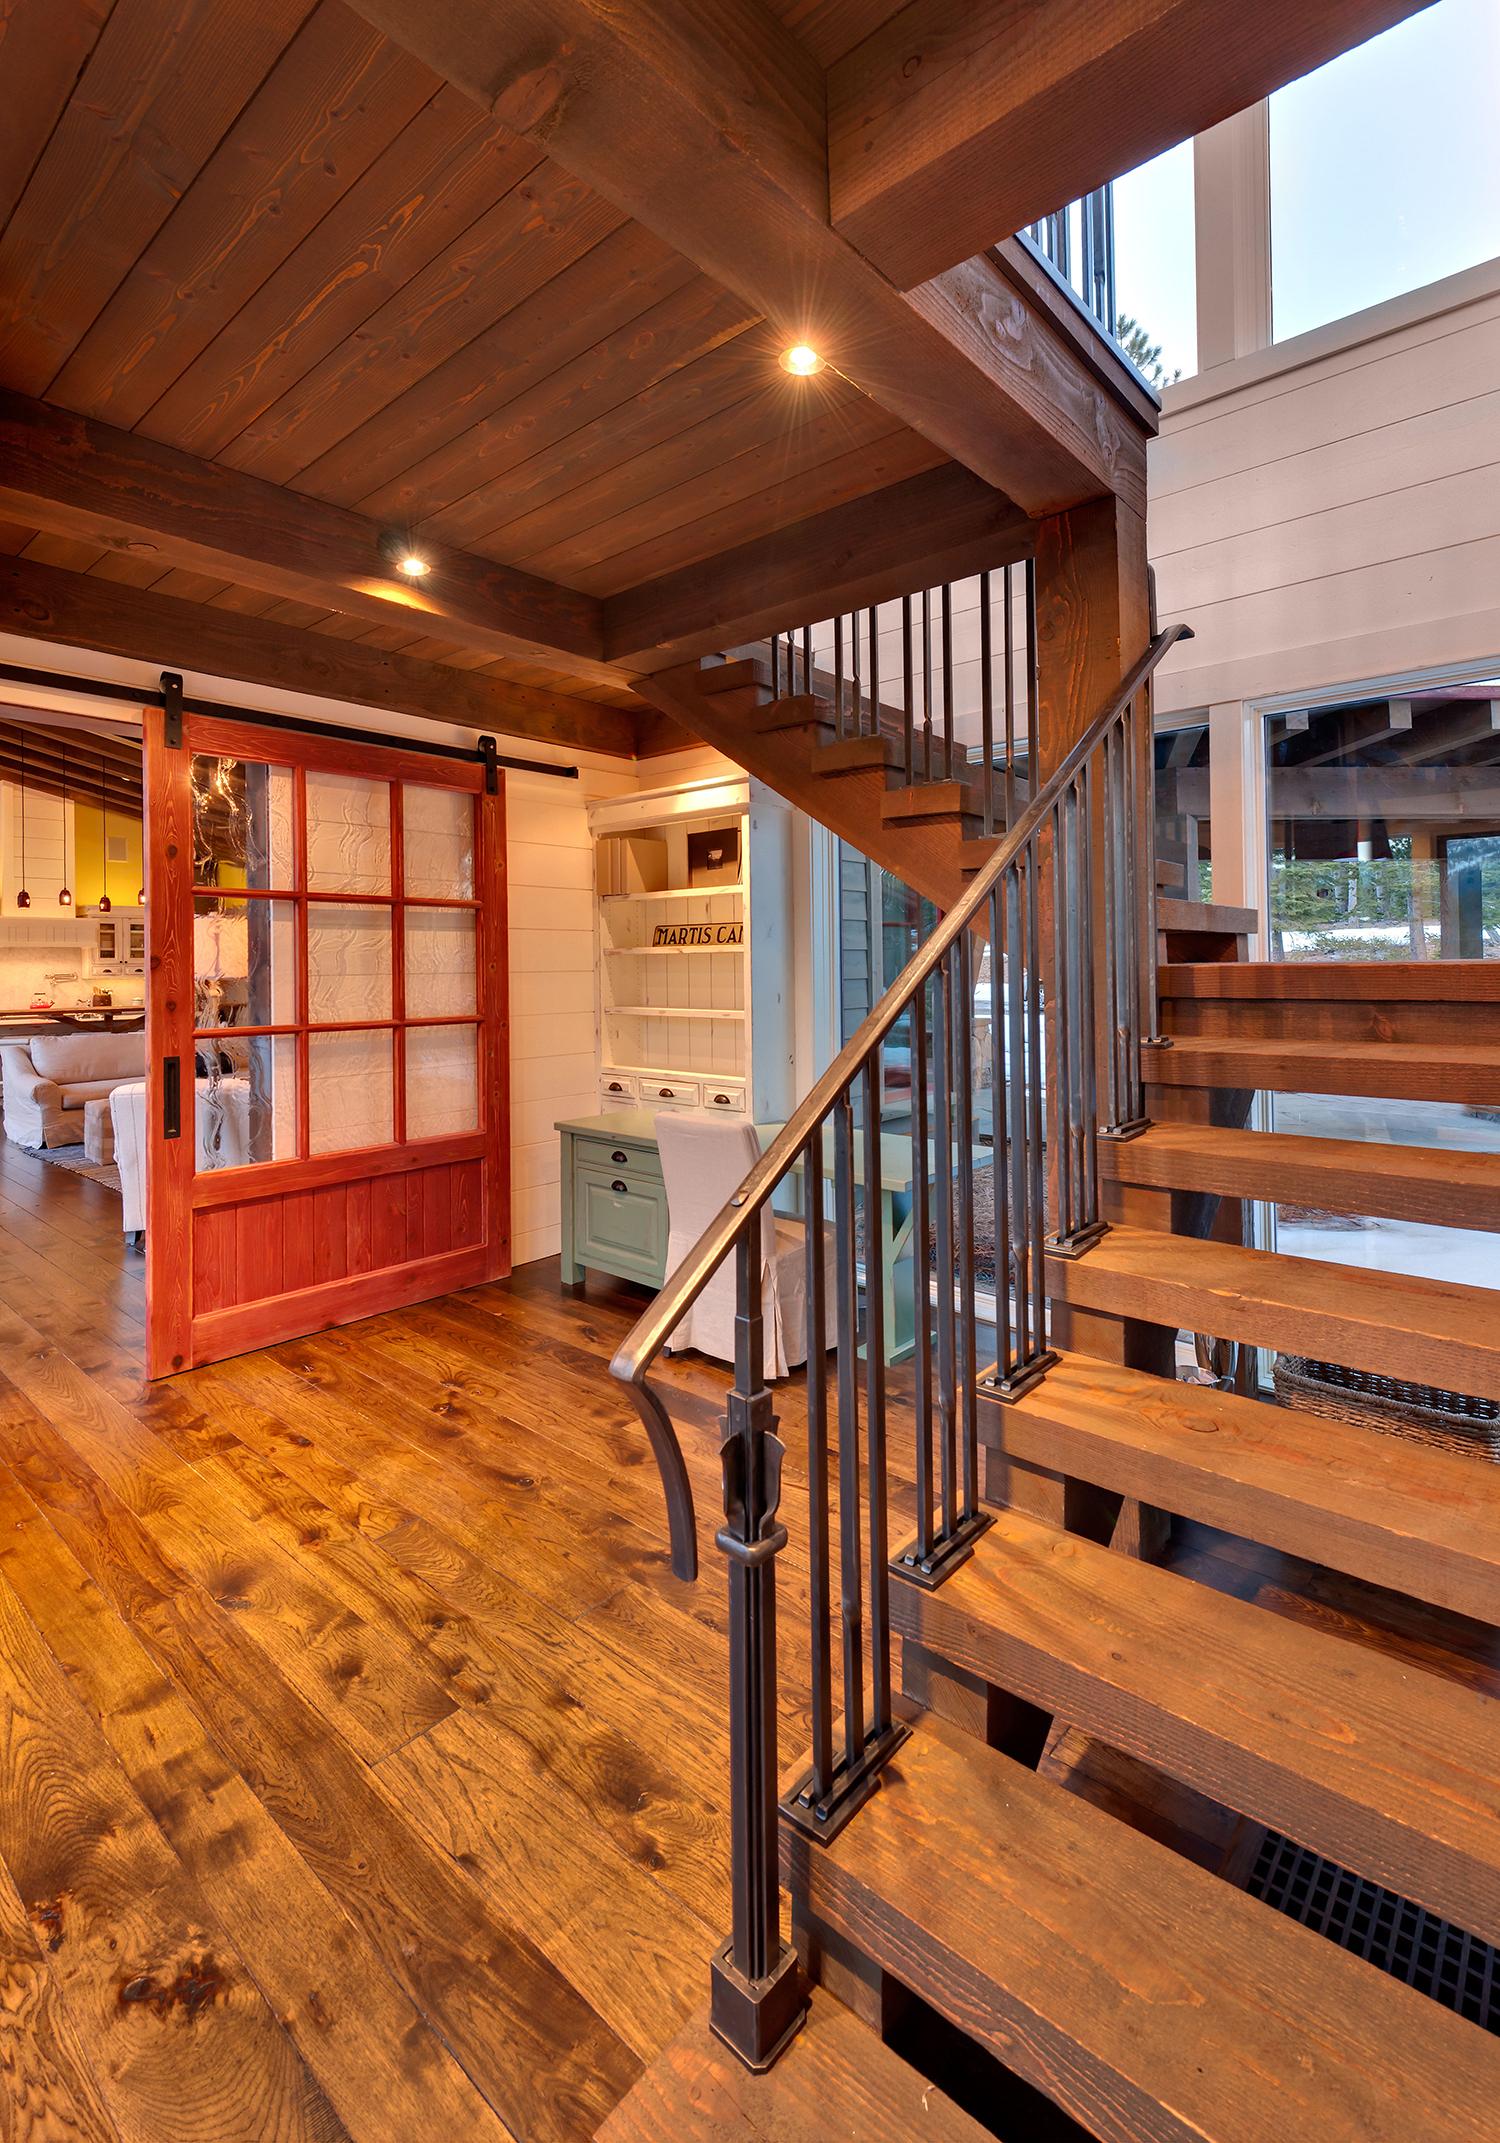 Lot 145_Staircase_Wood Paneling_Barn Door.jpg